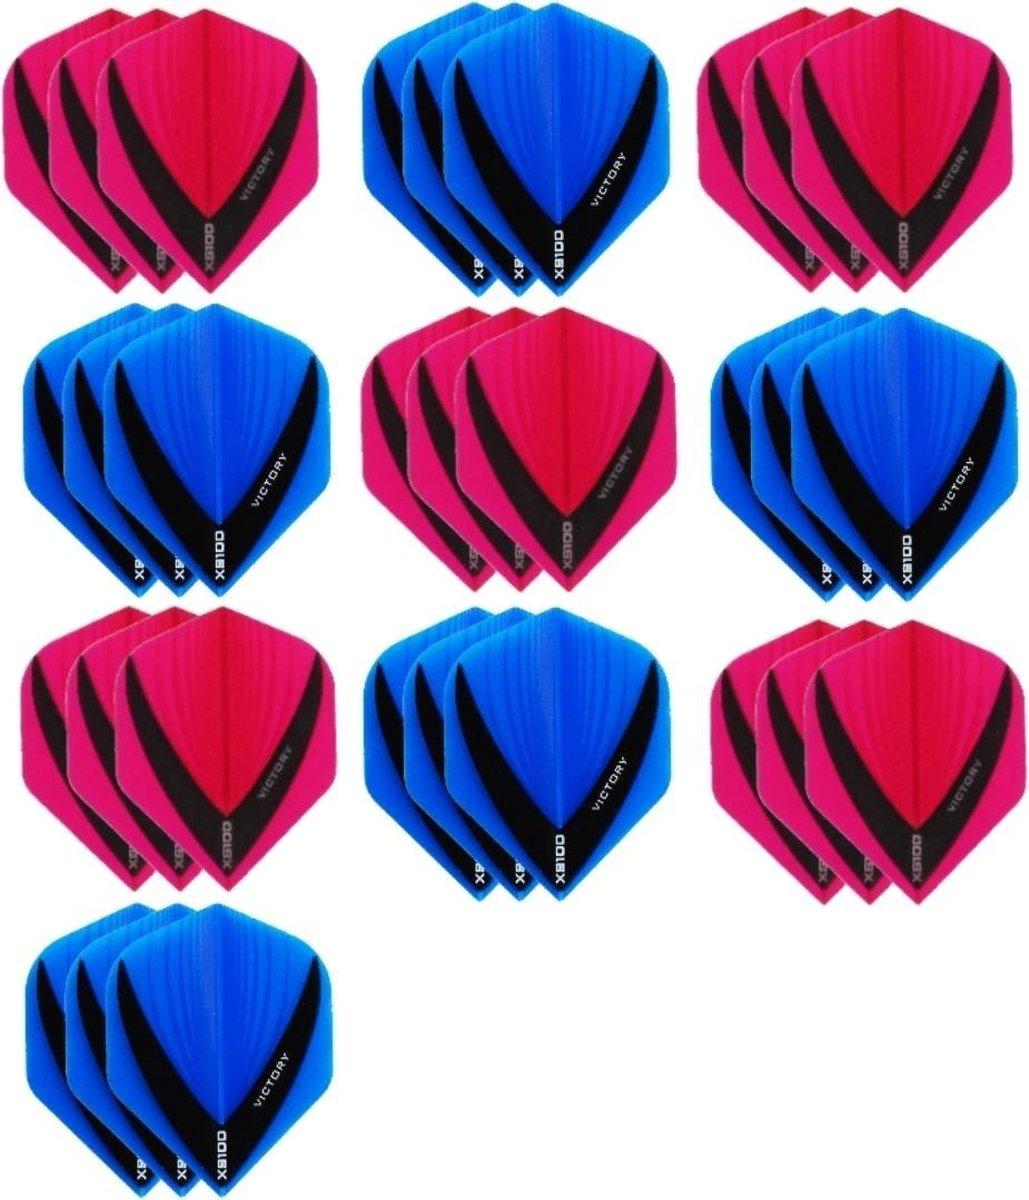 10 sets (30 stuks) - XS100 Vista flights - duo kleur pakket - Roze en Aqua/Blauw - flights - dartflights